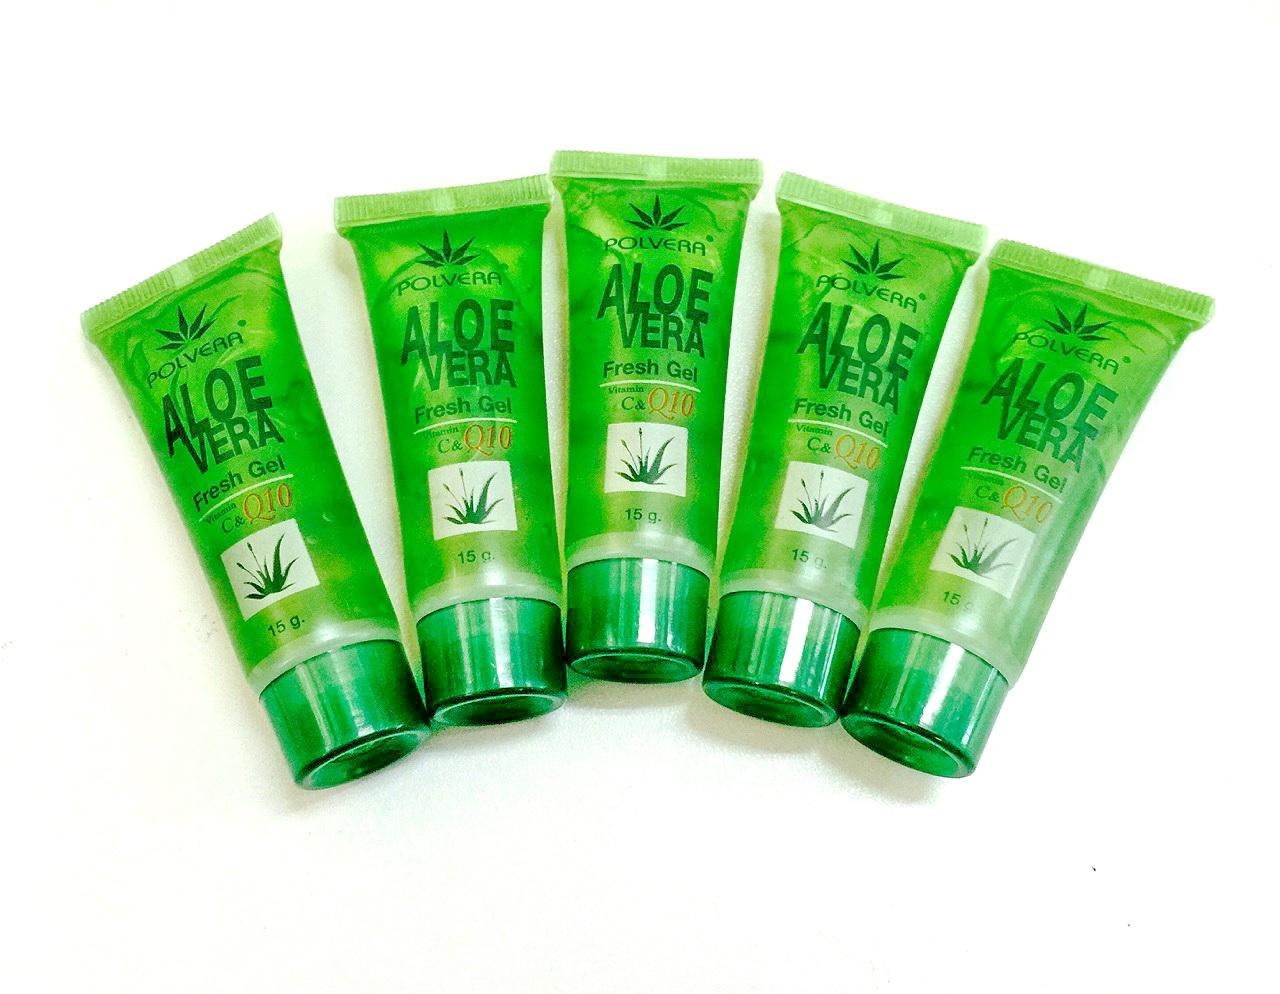 Polvera Aloe Vera Fresh Gel Vitamin C & Q10